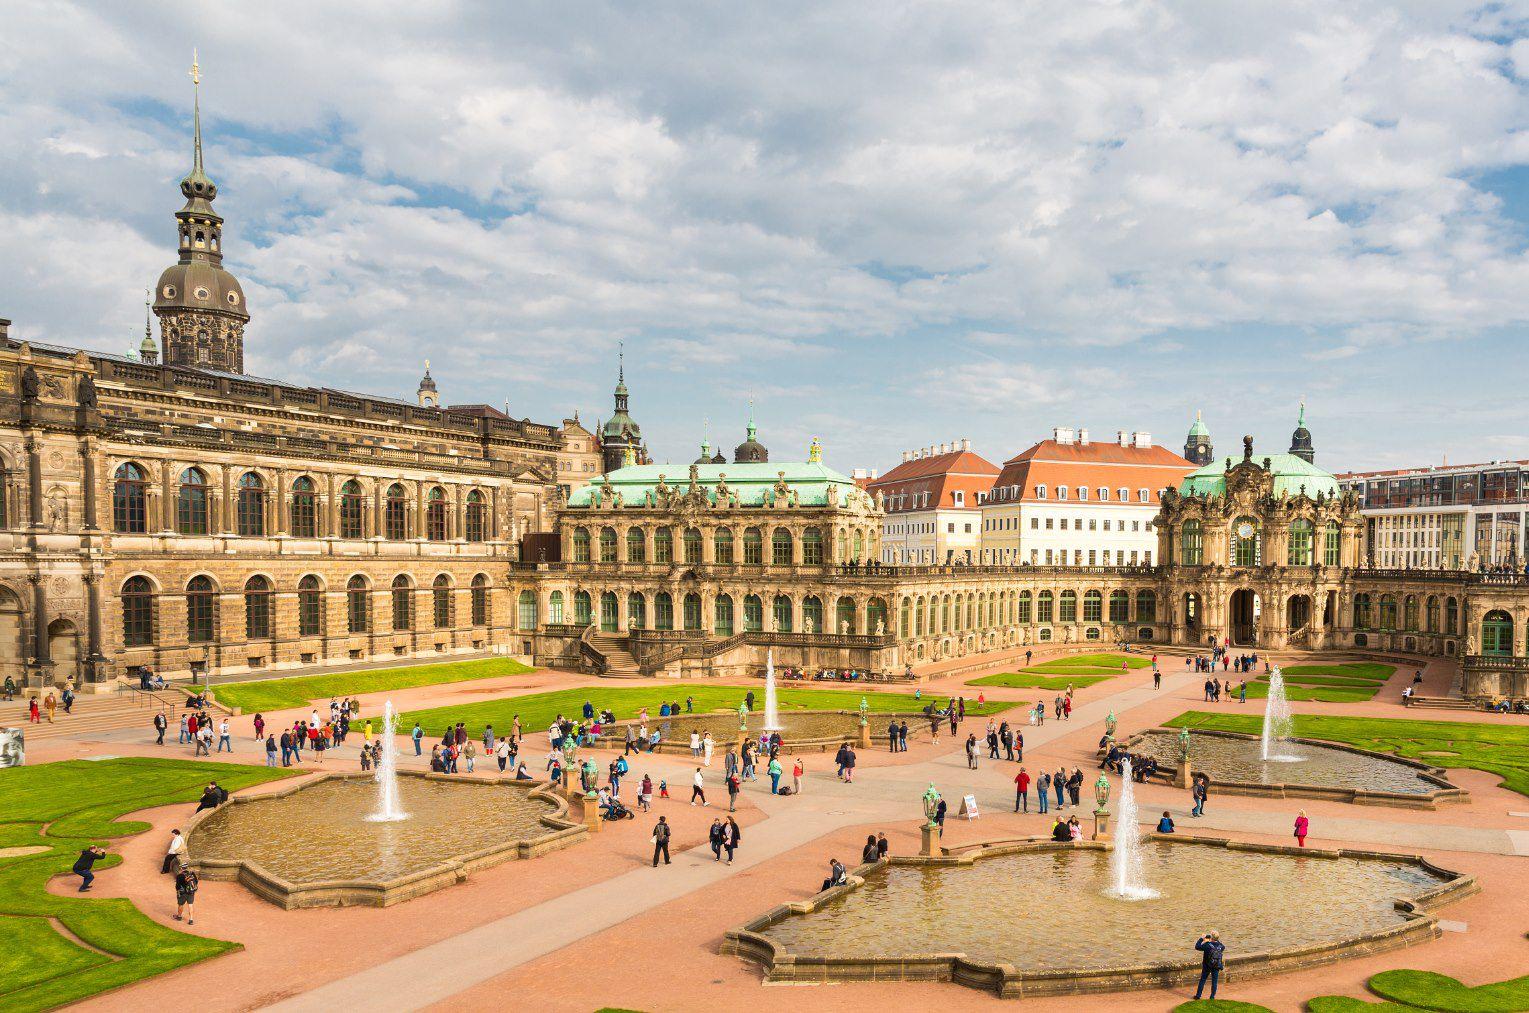 ÜN in Dresden inkl. Frühstück, Spa & kostenlosen Kaffee + Tee ab 39€ p.P.